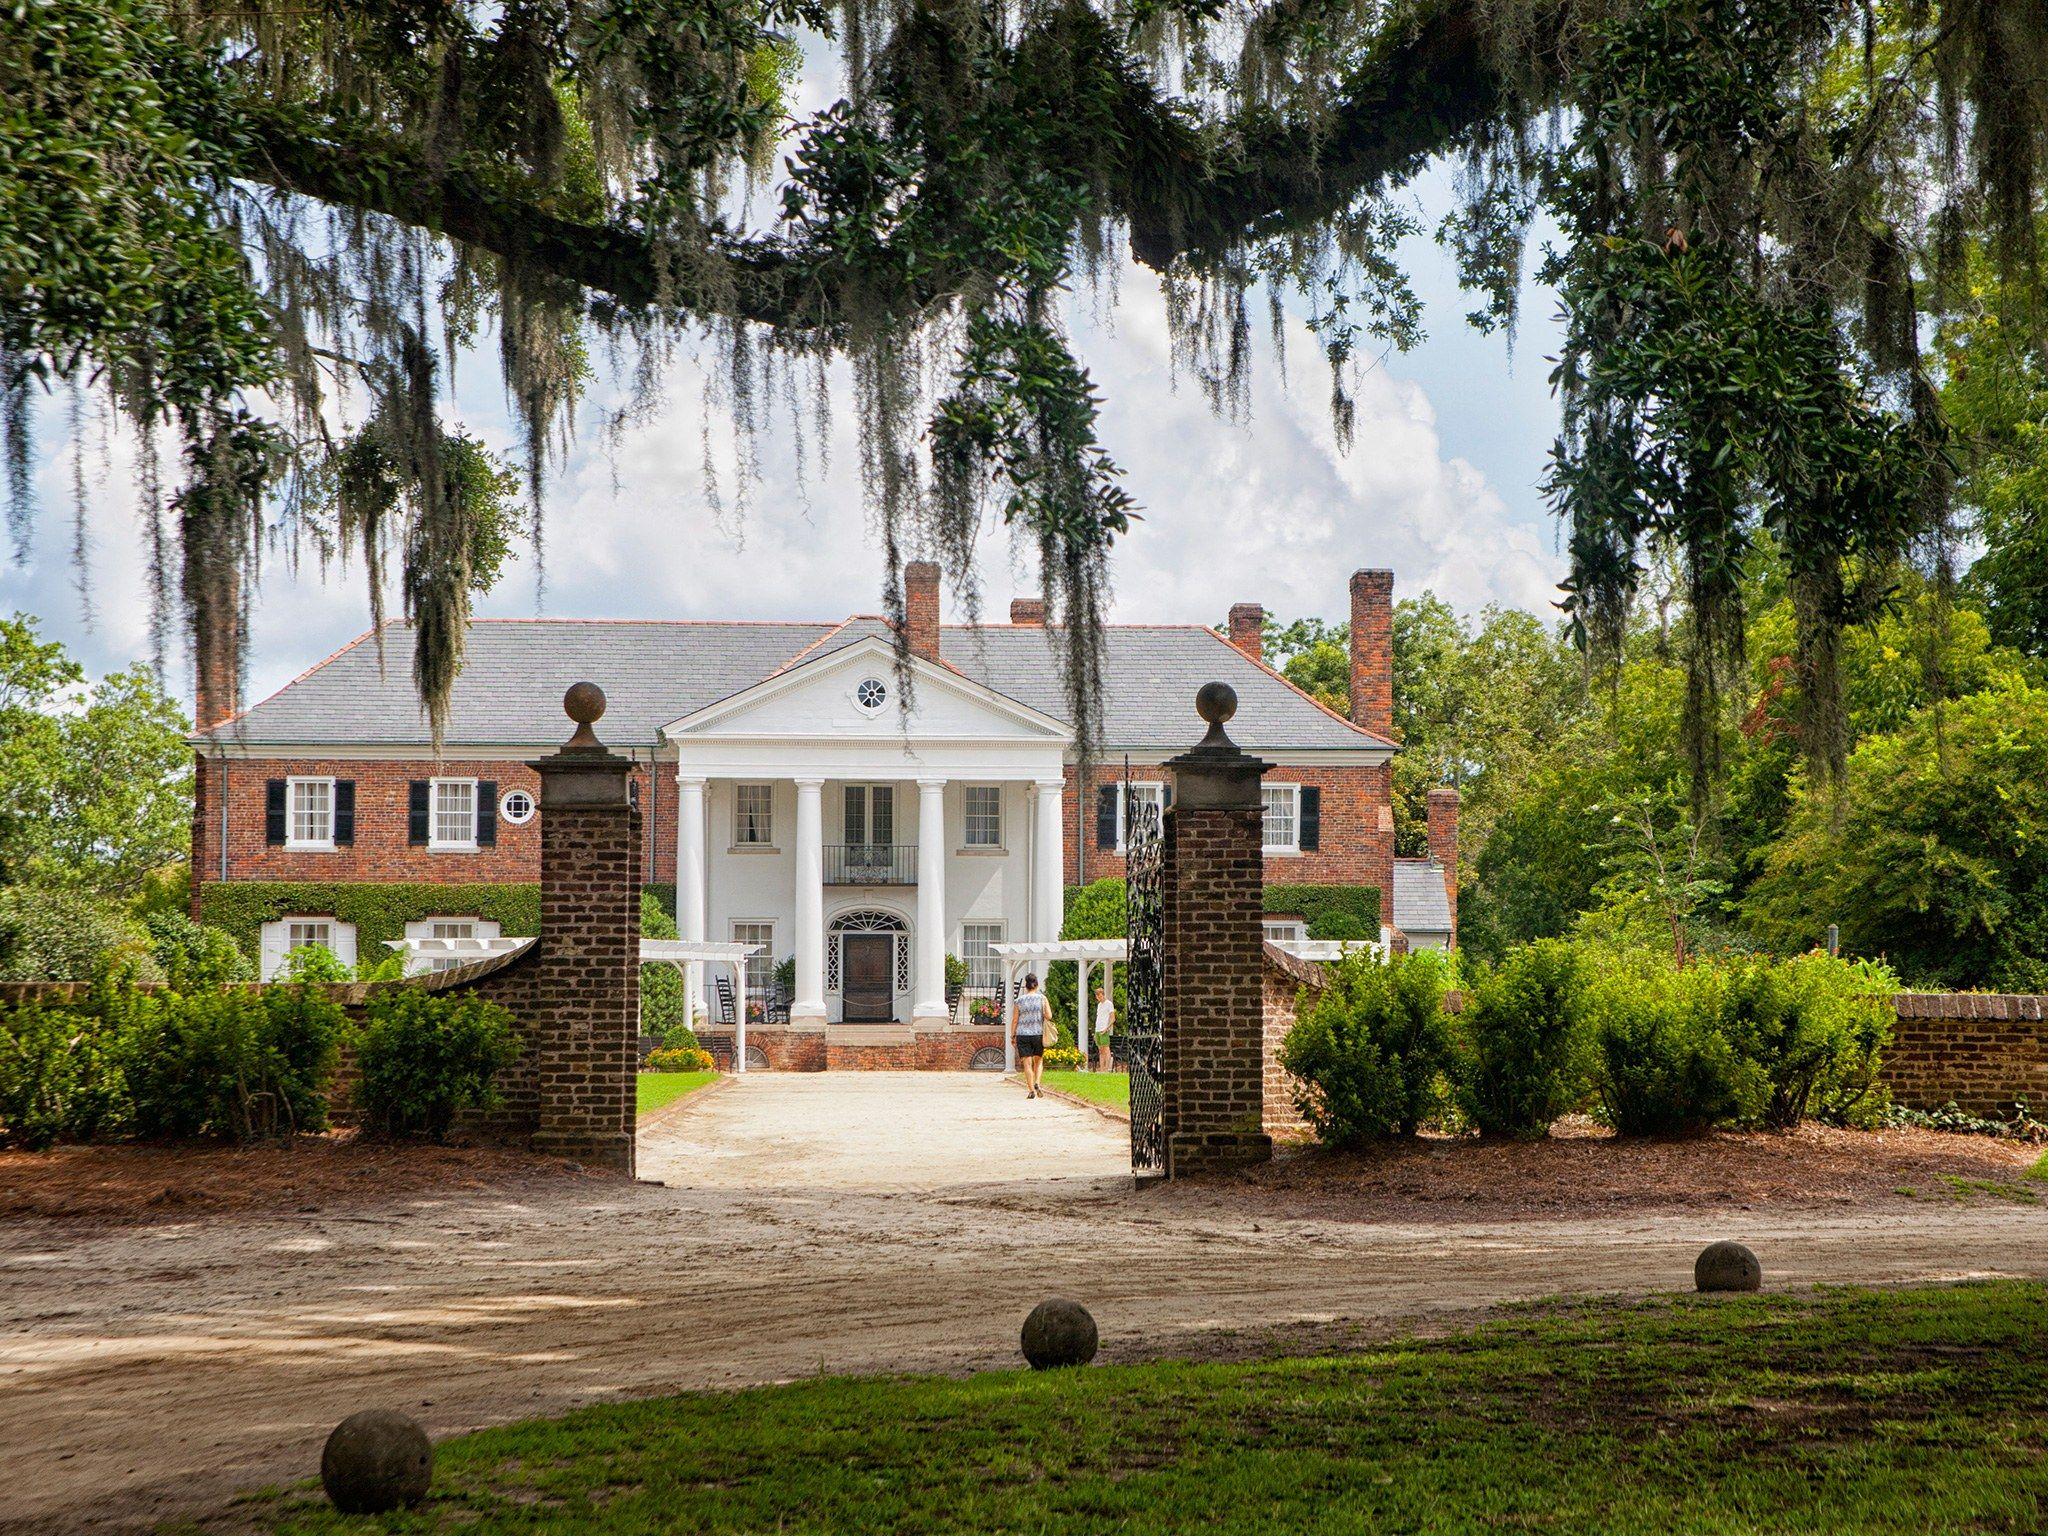 29bd56ce0fd61fd908f87d4b4bc383dc - Boone Hall Plantation & Gardens Charleston Sc